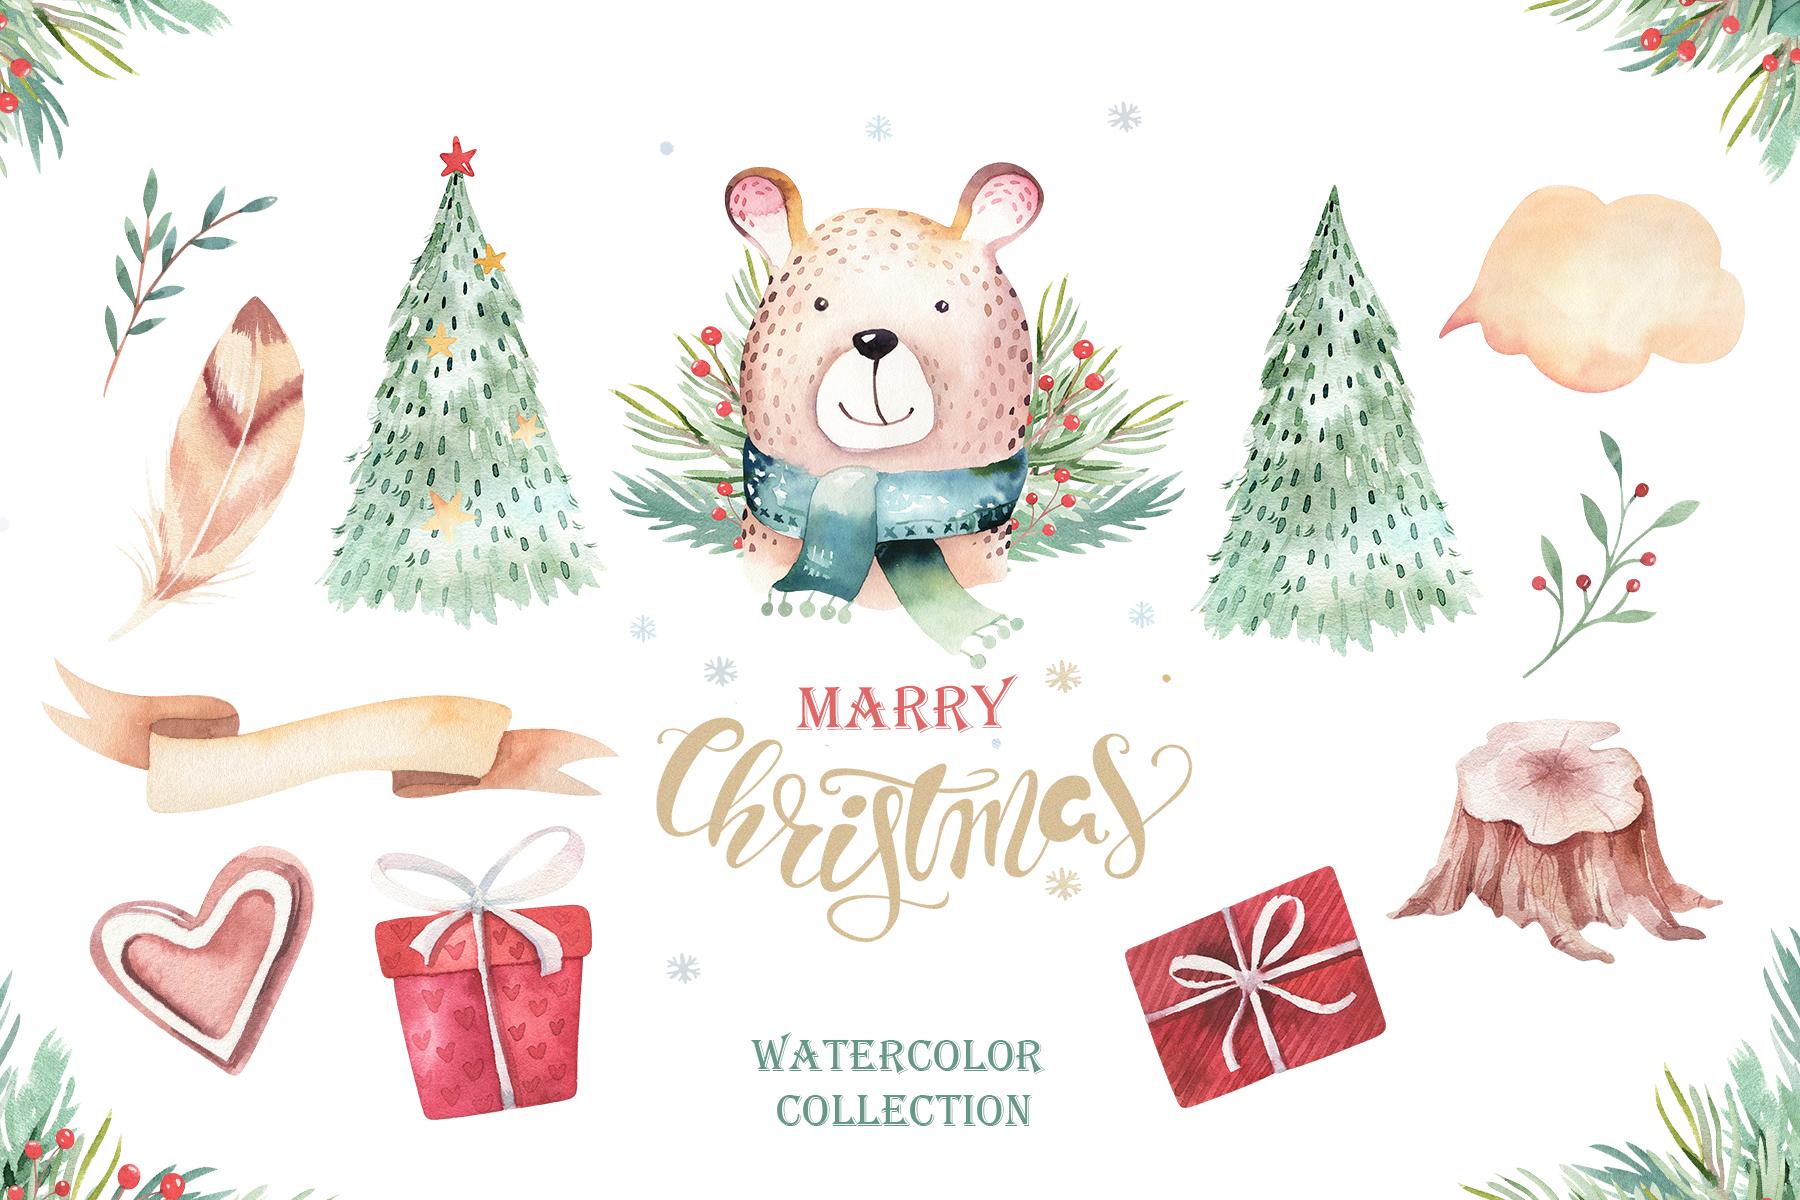 Watercolor Christmas animals raccoon, bear, deer and penguin example image 4